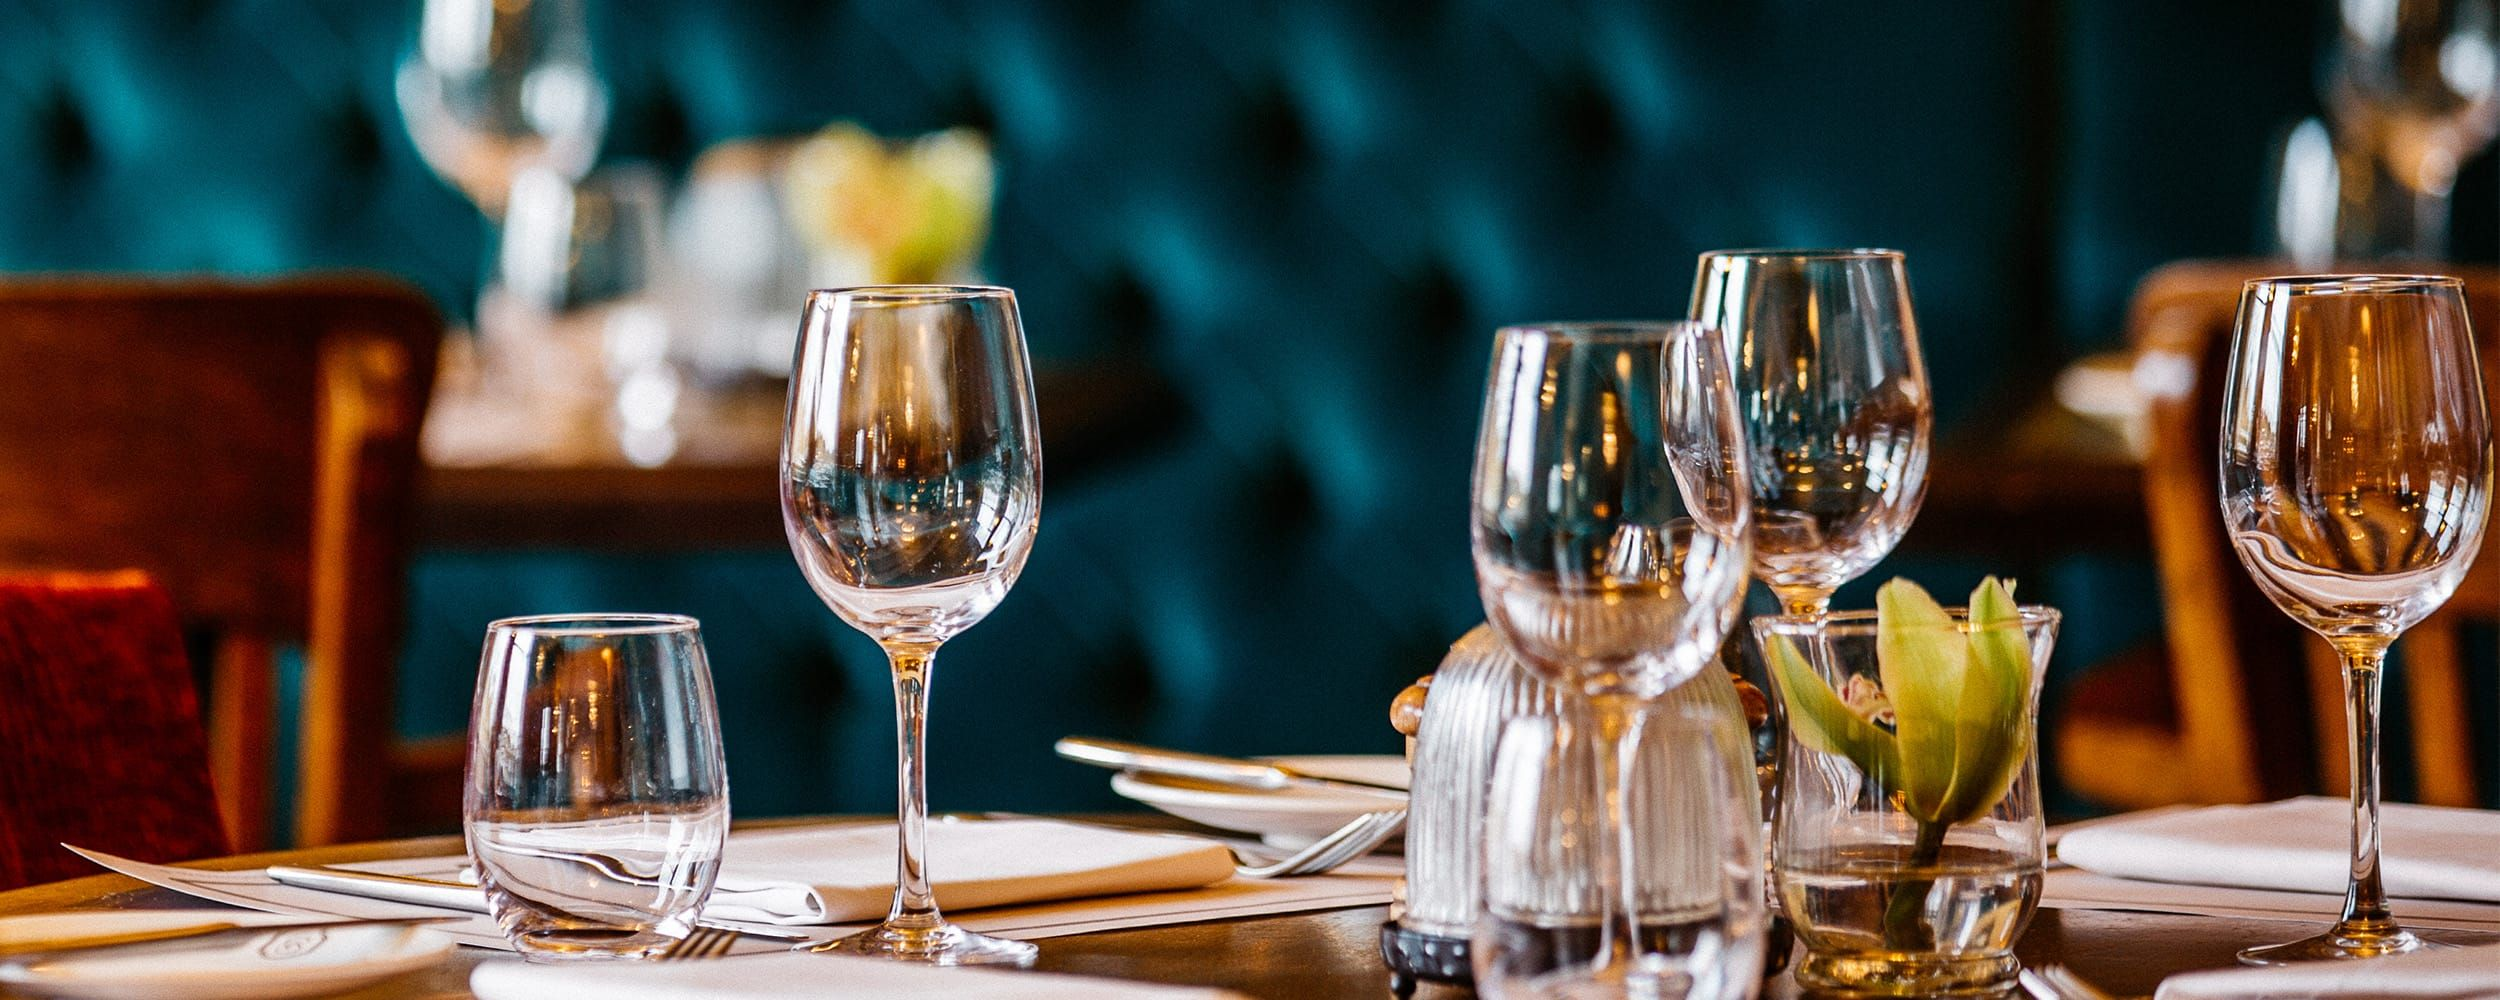 Meeting & private dining Meeting & private dining